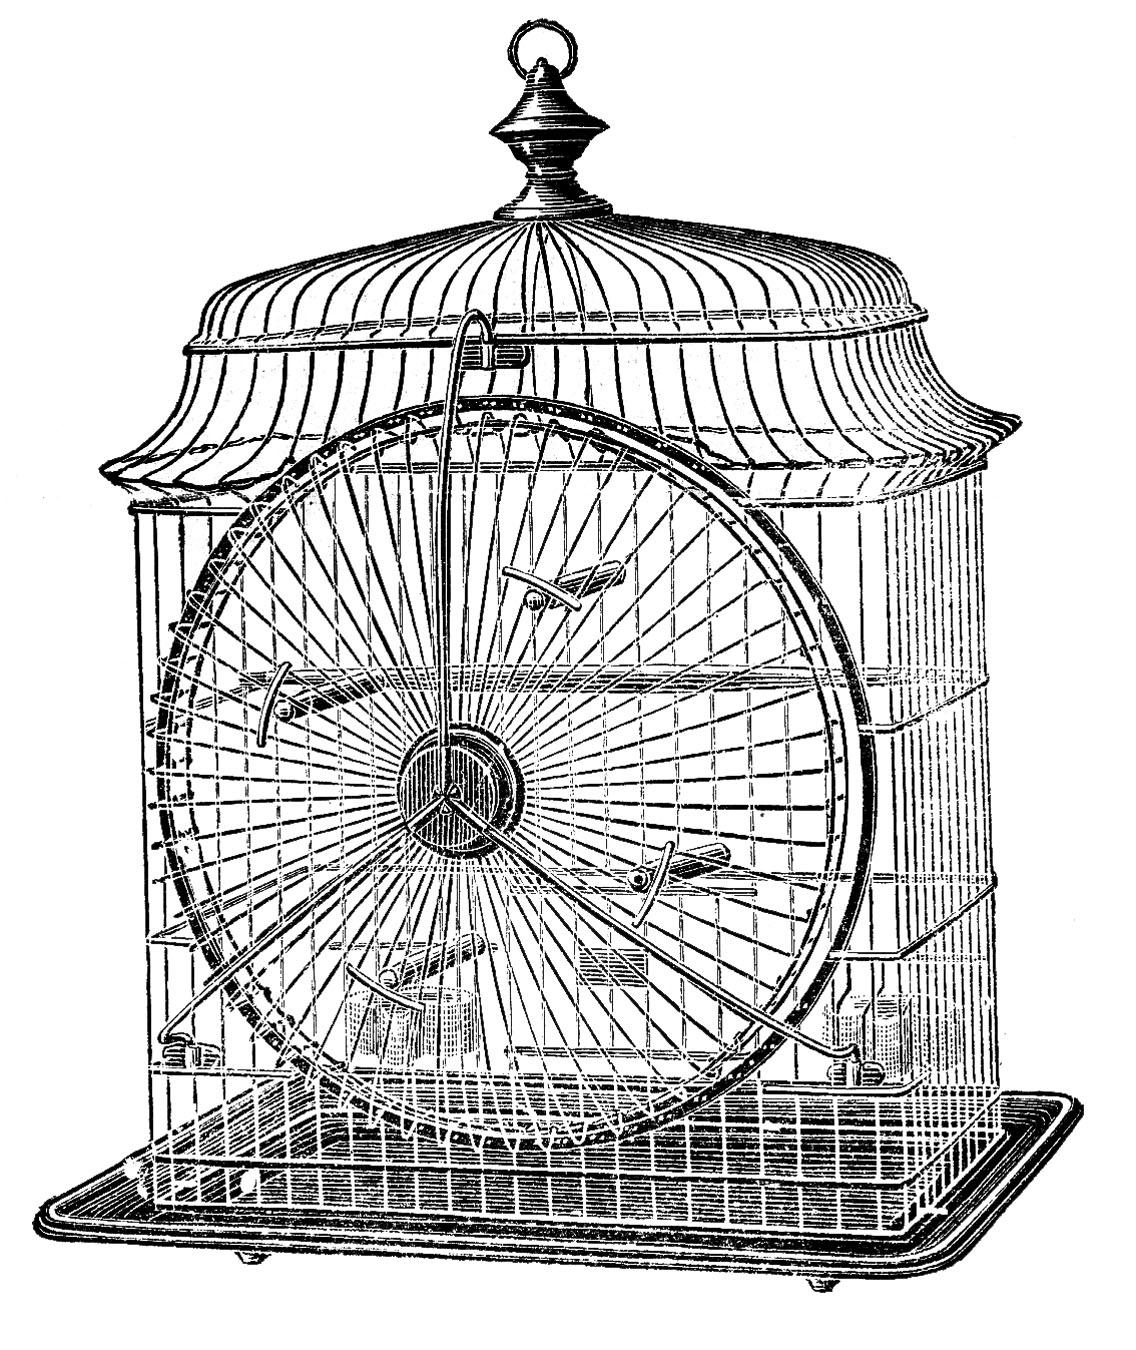 Betting birdcage bet on big brother winner